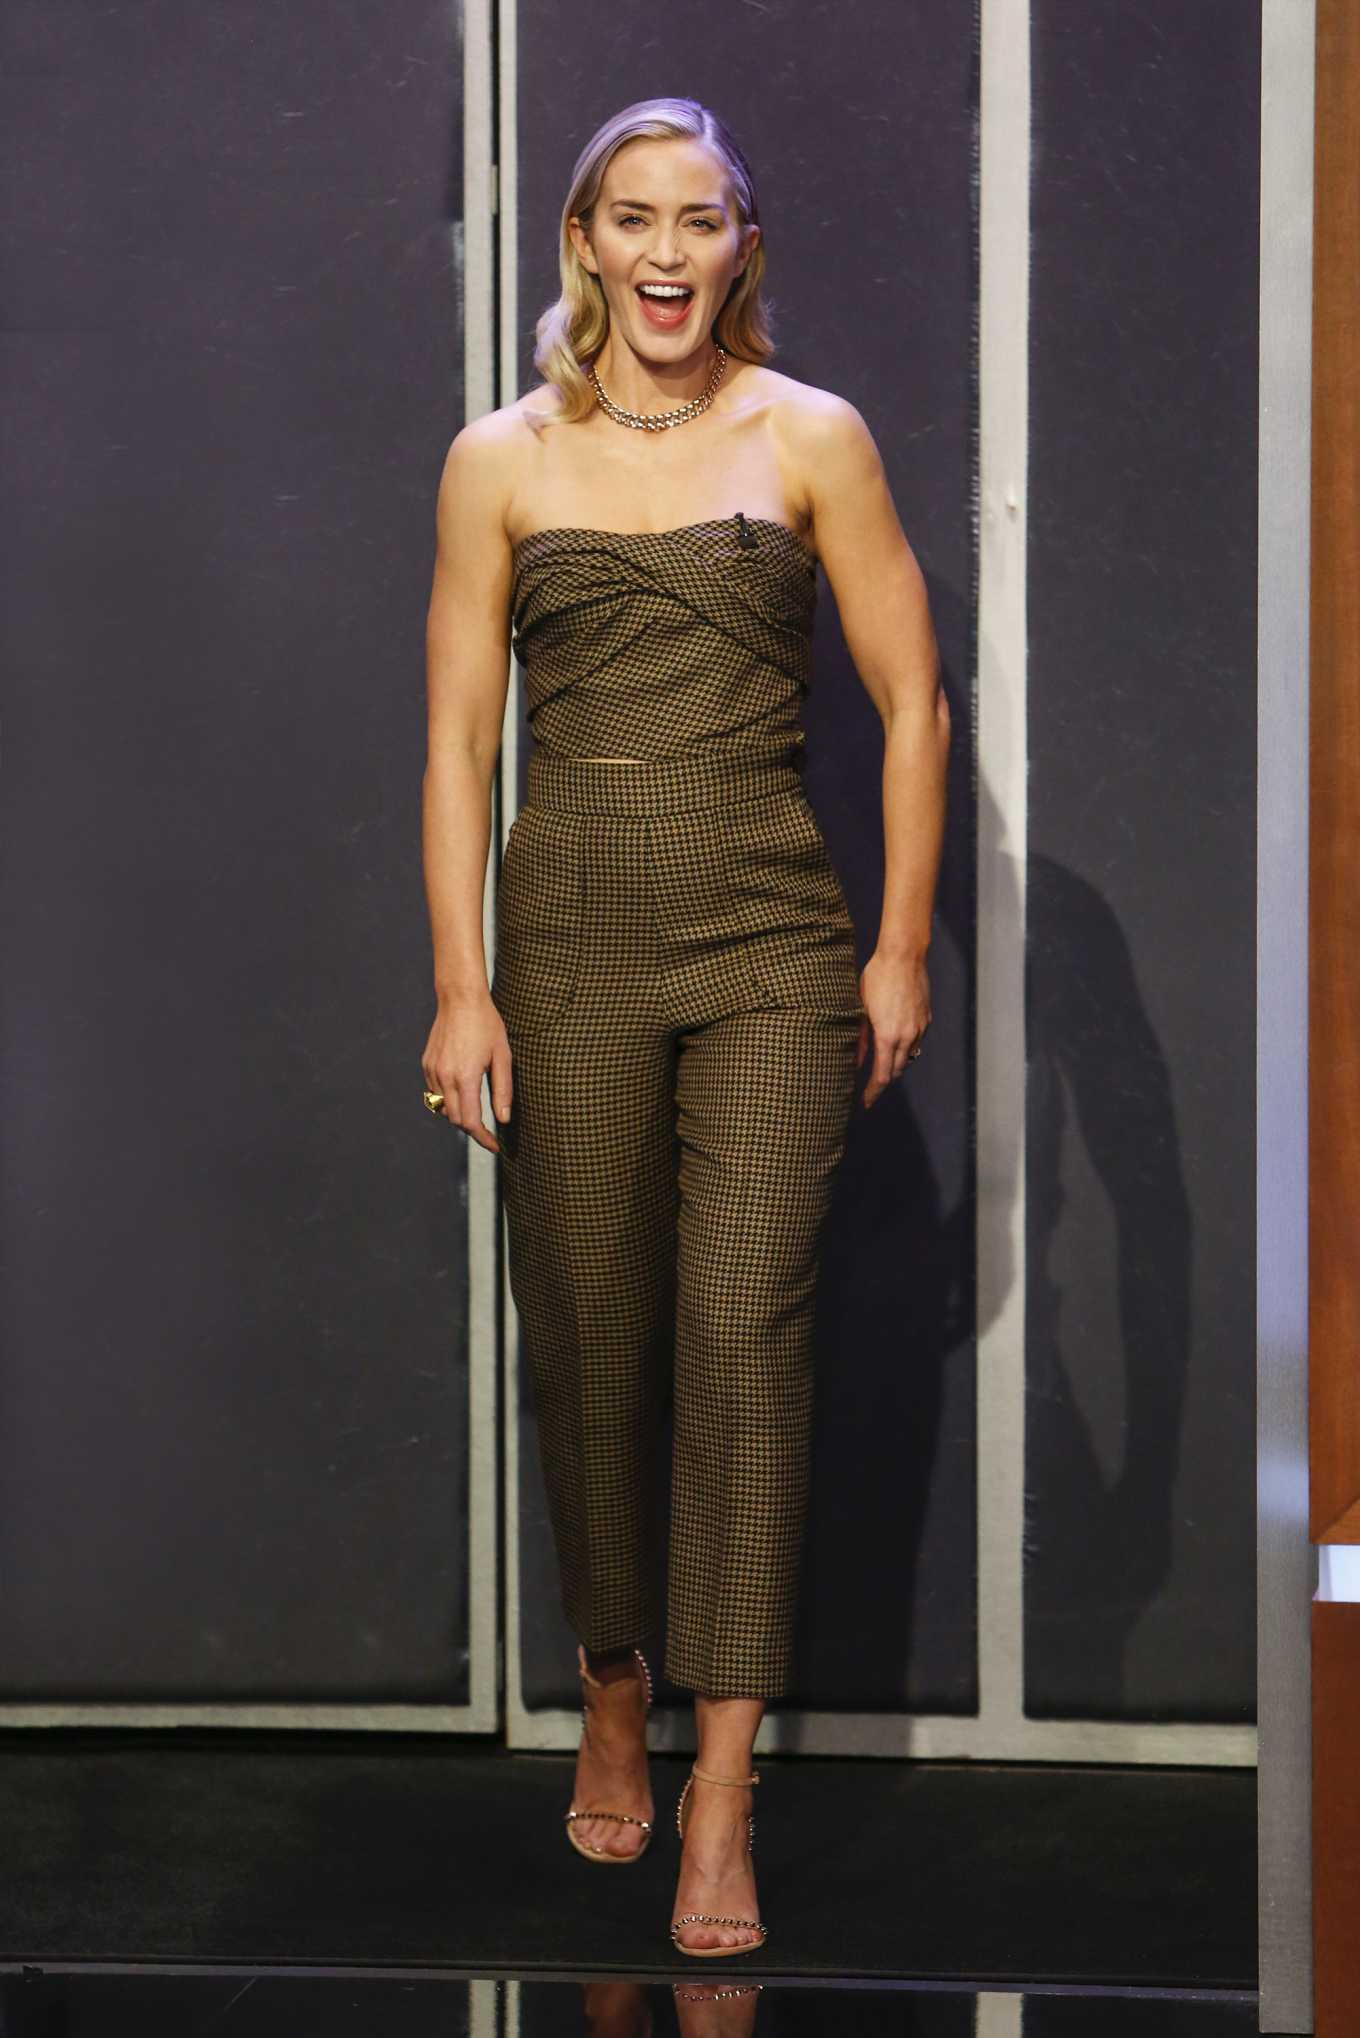 Emily Blunt - On Jimmy Kimmel Live in Los Angeles